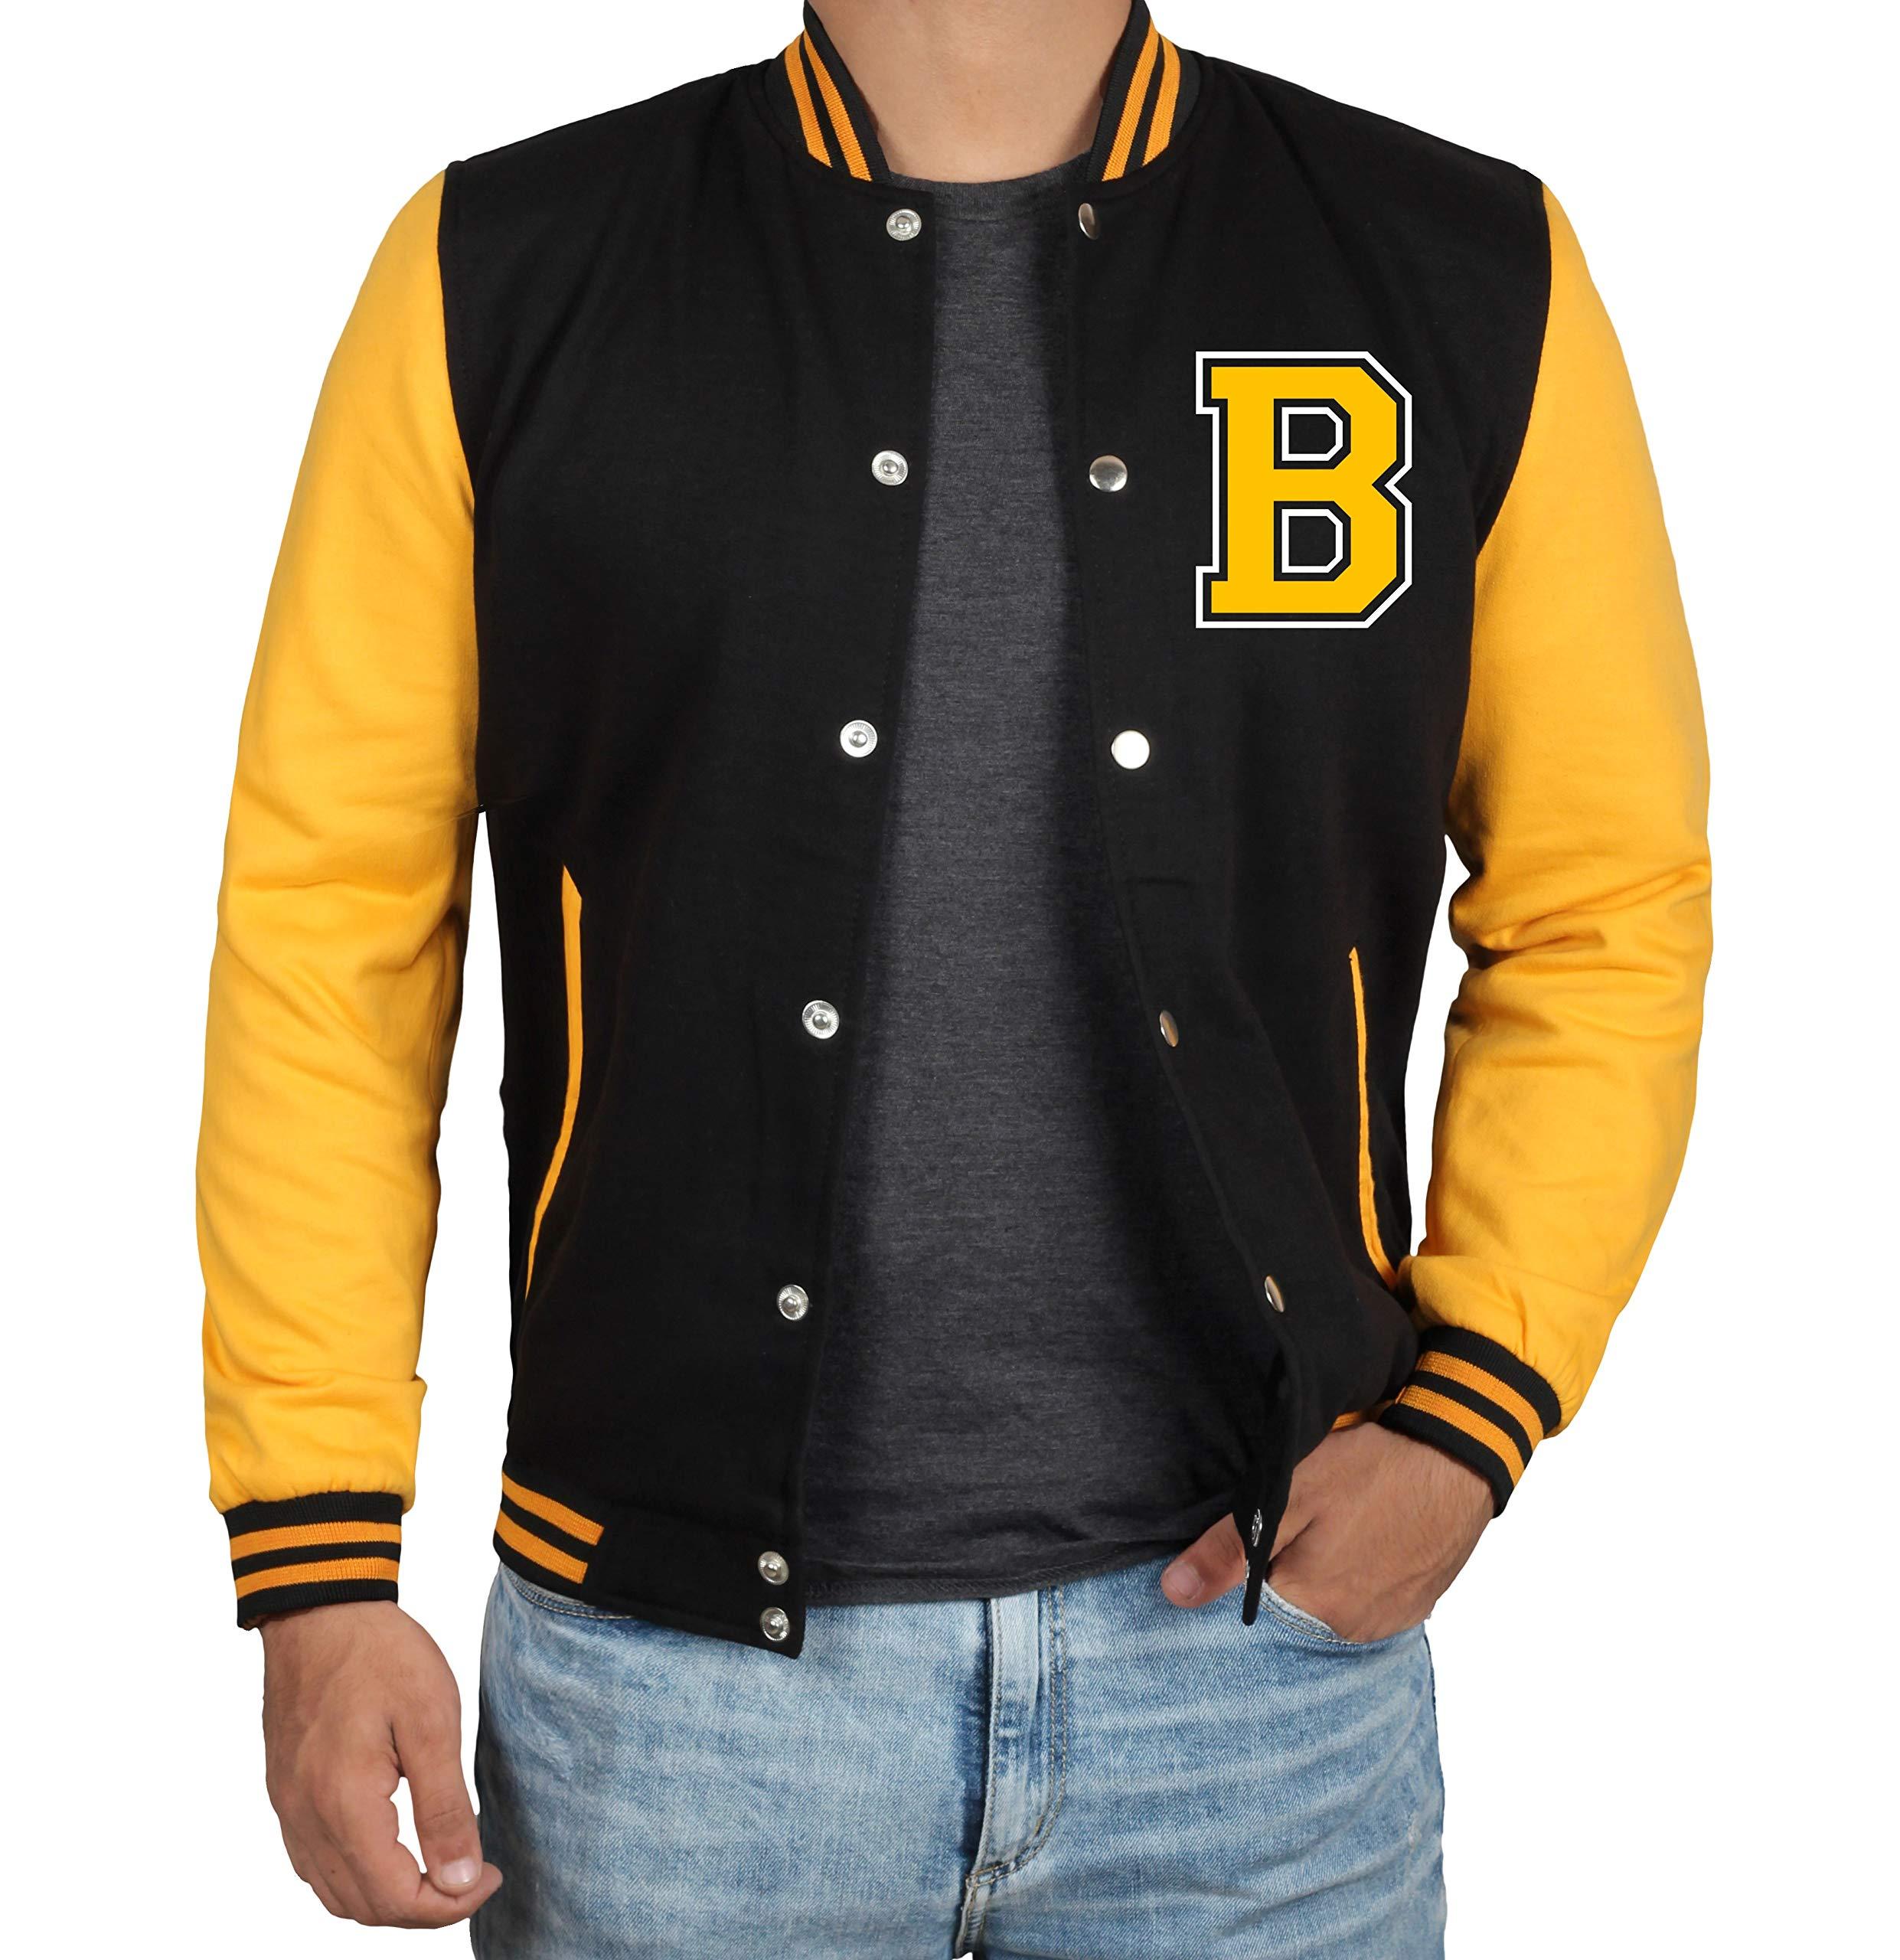 Mens Varsity Jacket - High School Football Jacket | B Yellow Sleeve | M by Decrum